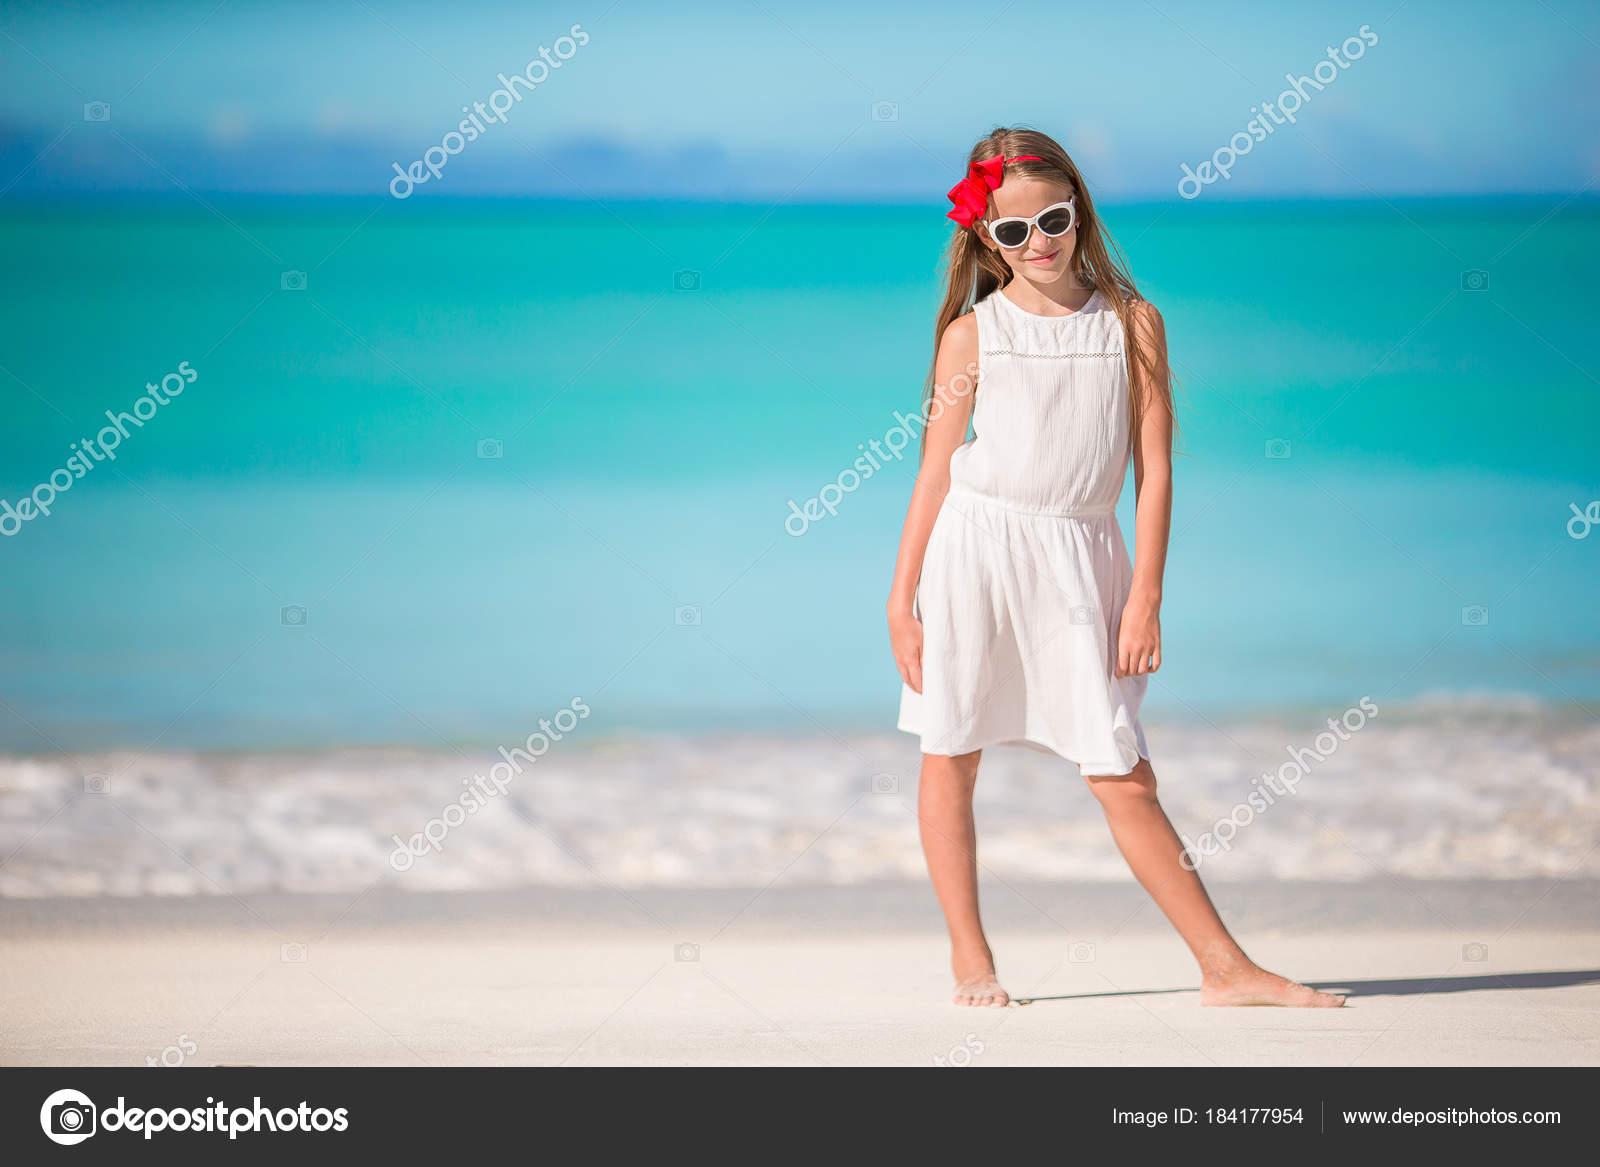 Vestidos Blancos De Playa Para Niñas Hermosa Niña En